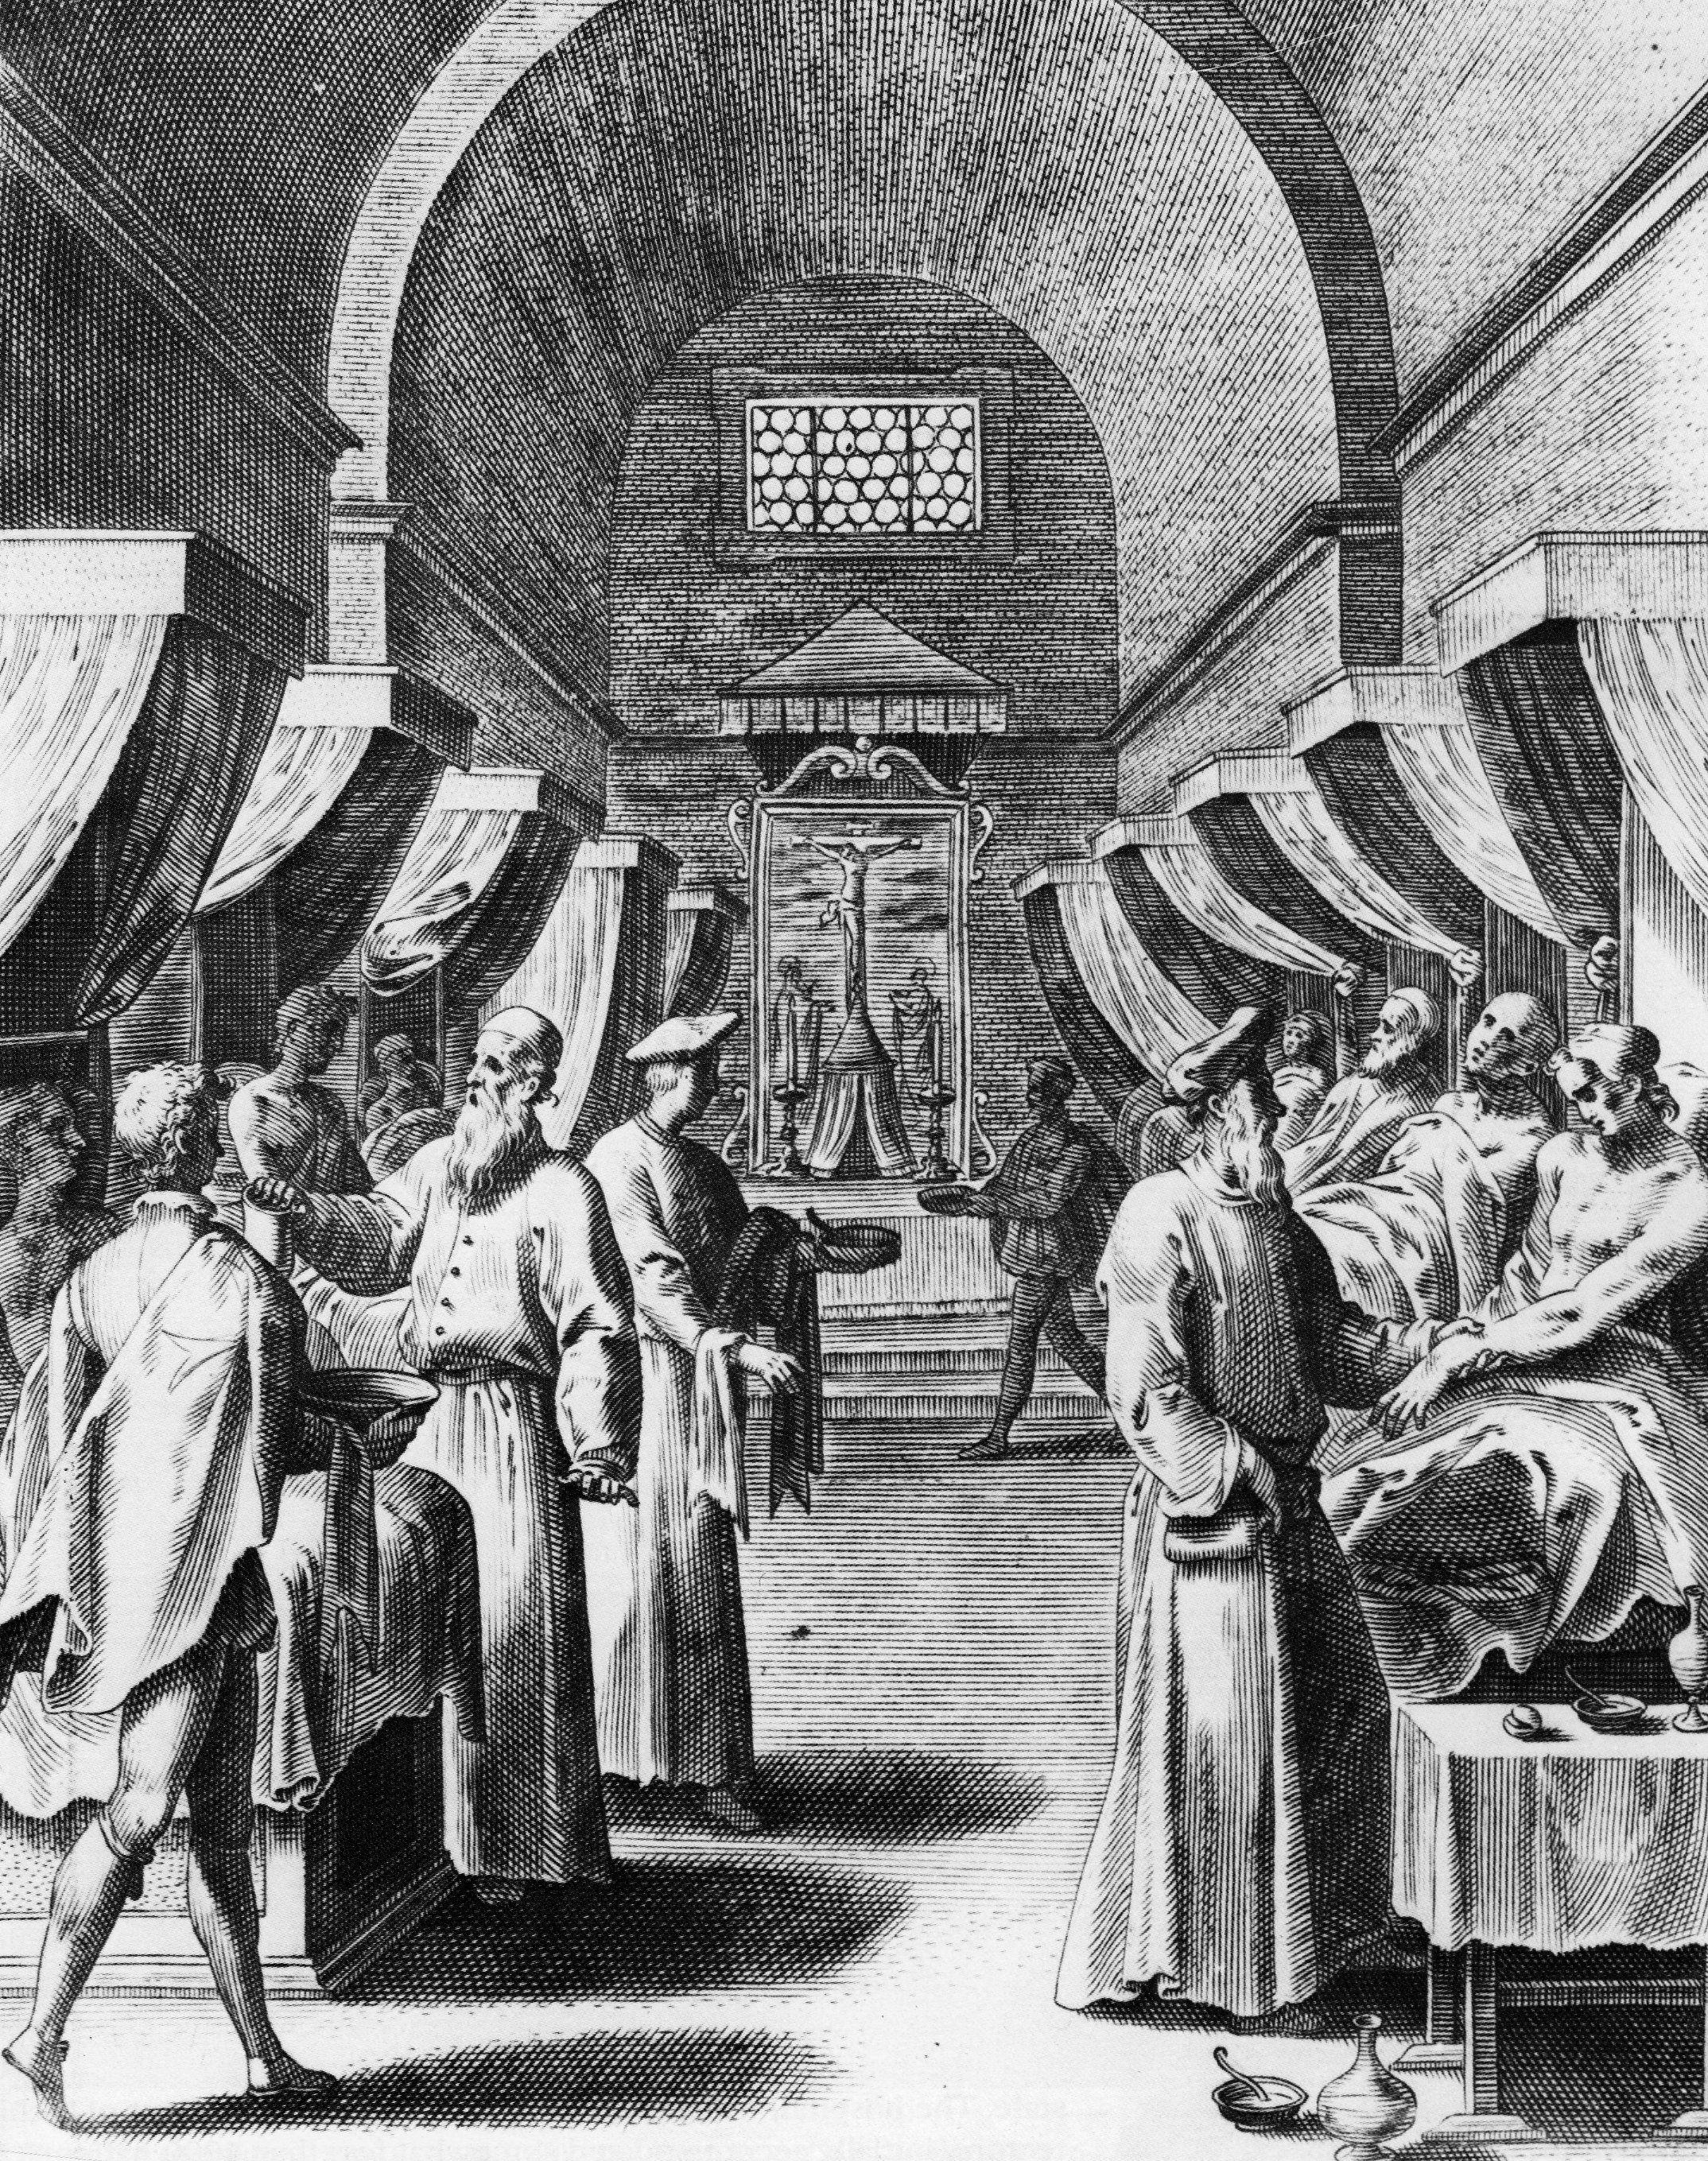 knight hospitalliers 1676 the art of nursing history pinterest